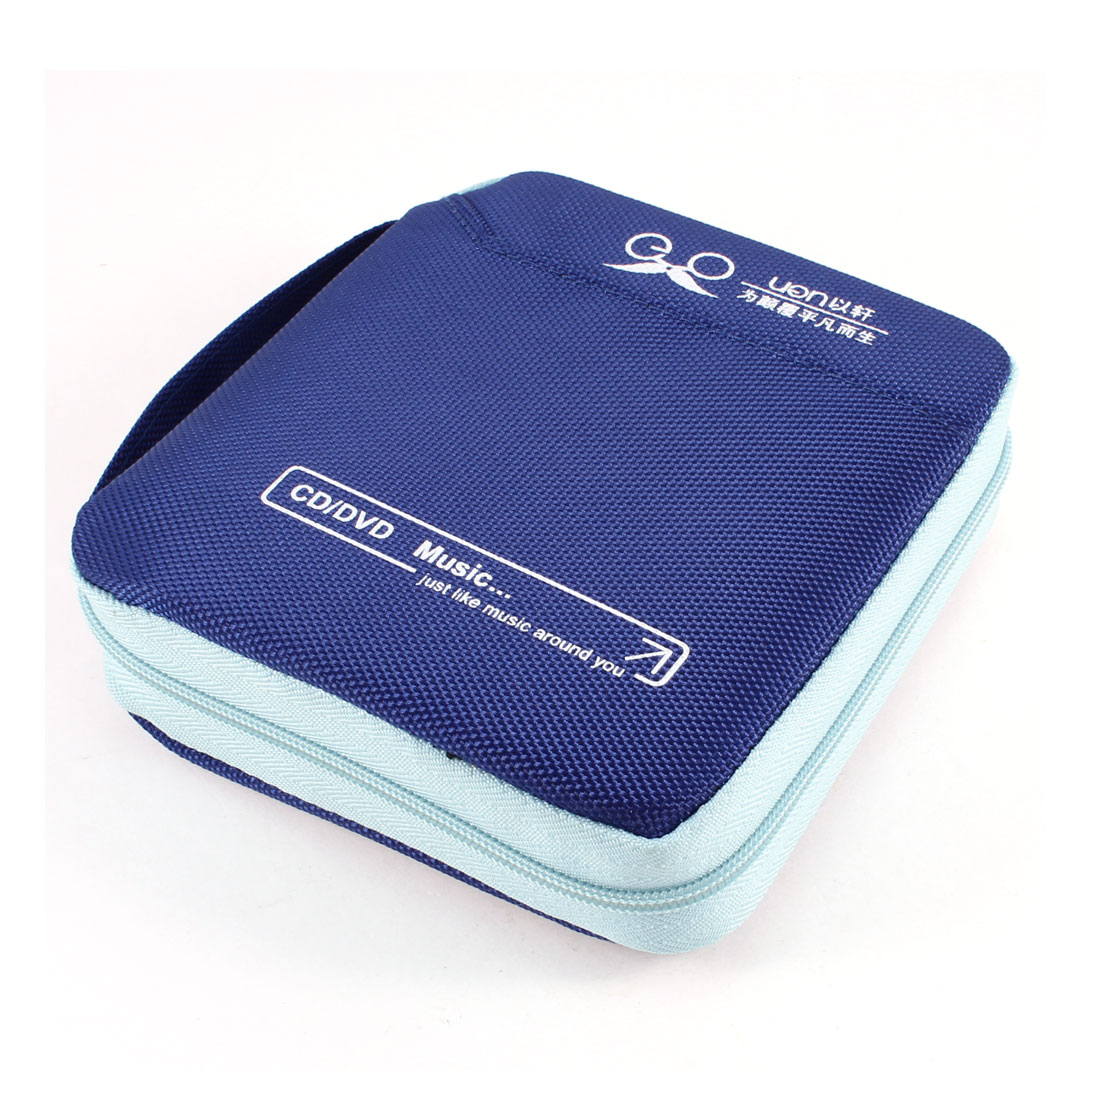 Indigo Blue 32pcs Capacity CD DVD Holder Storage Container w Hand Strap